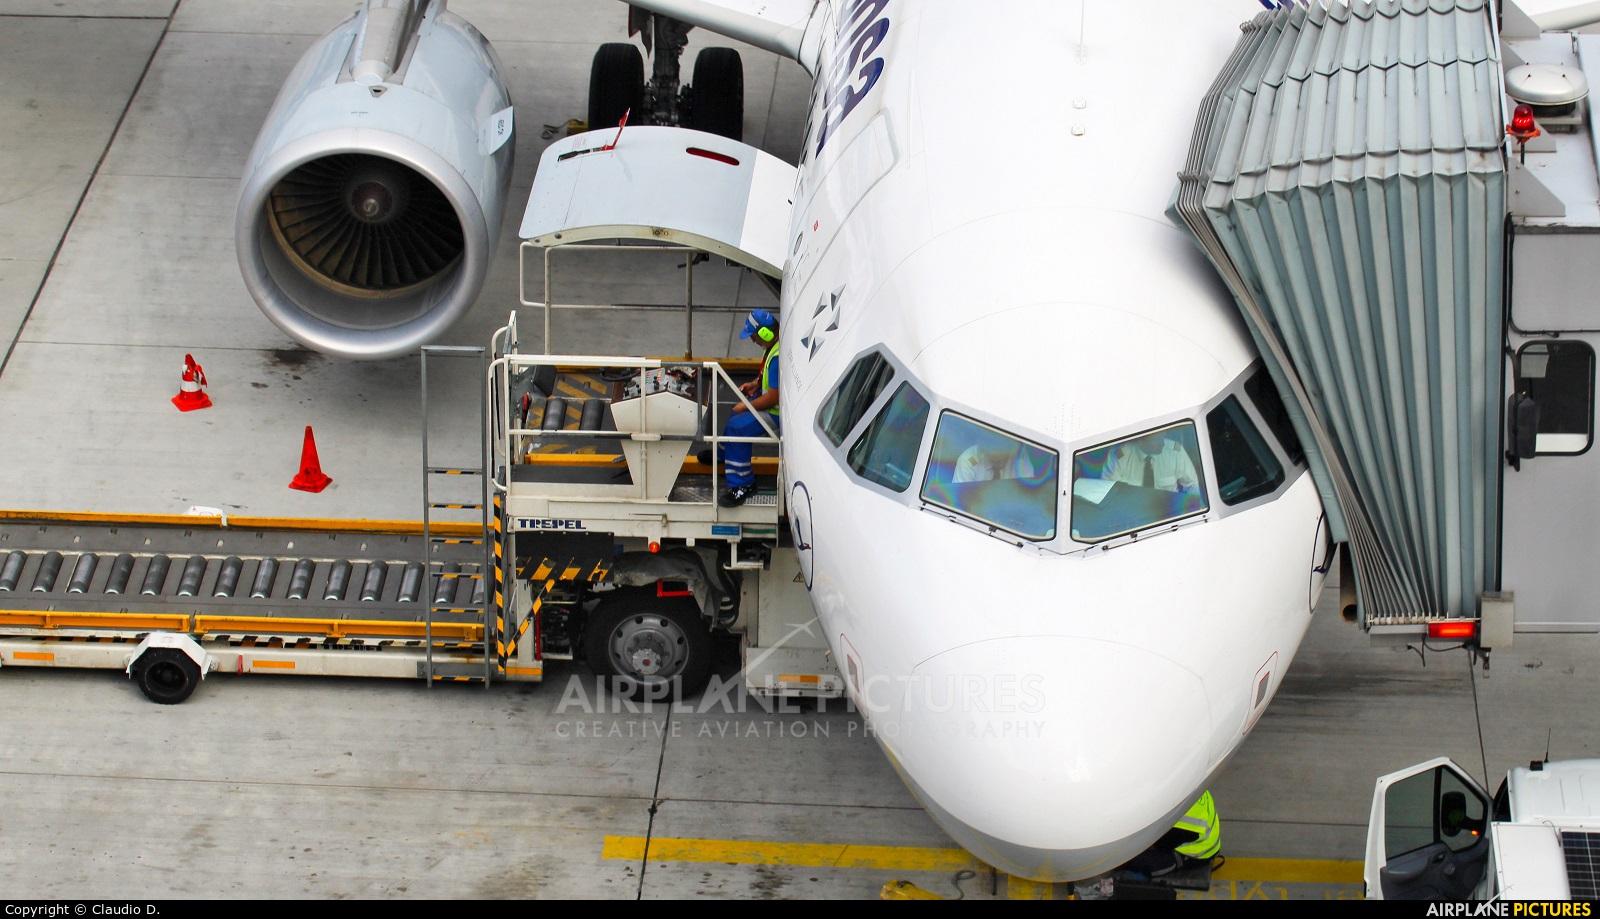 Lufthansa - aircraft at Frankfurt